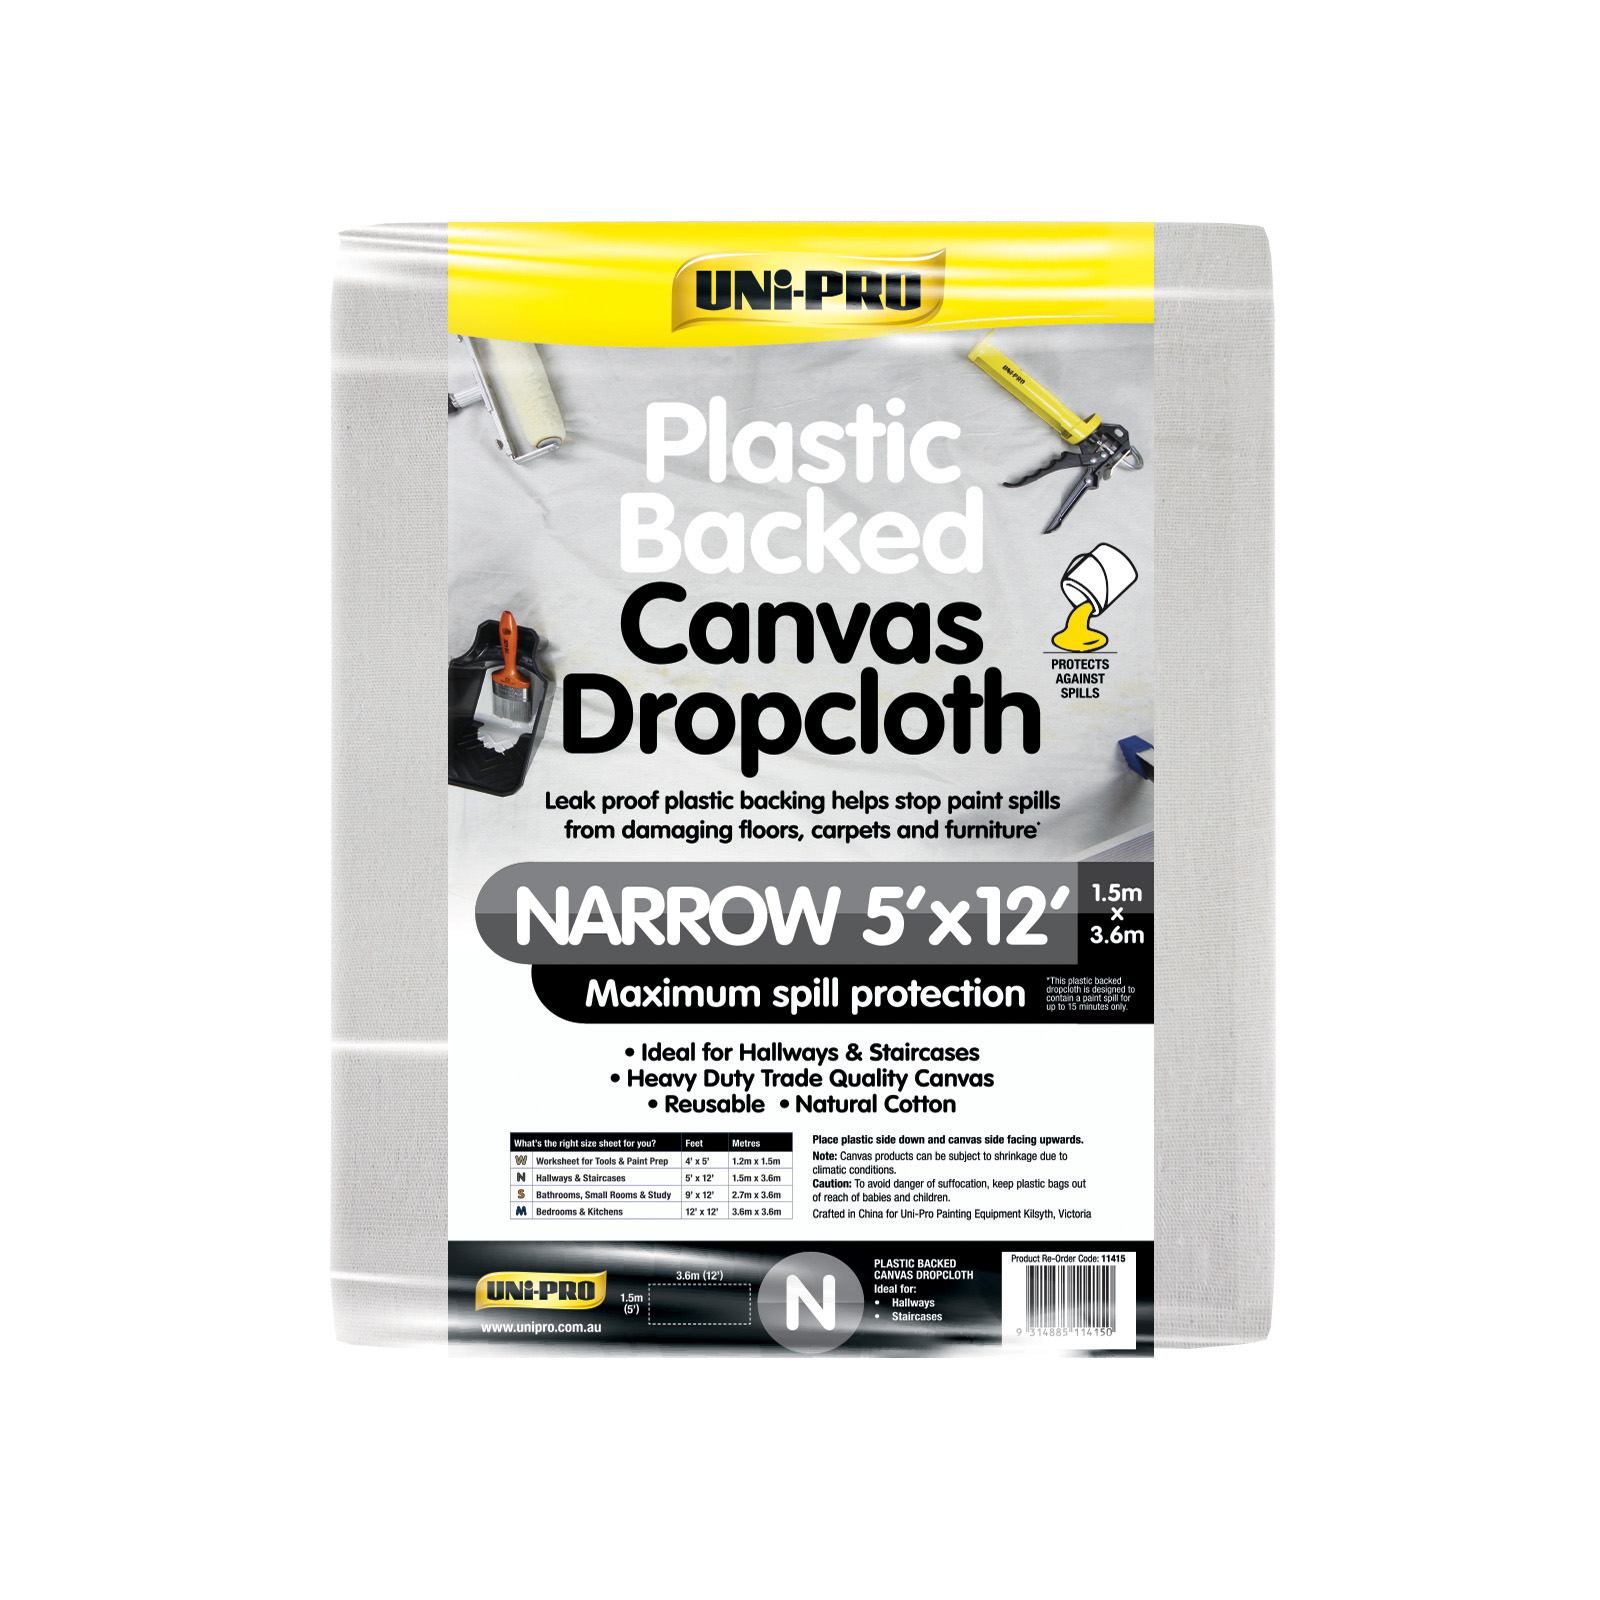 UNi-PRO Heavy Duty Plastic Backed Canvas Dropcloth Range